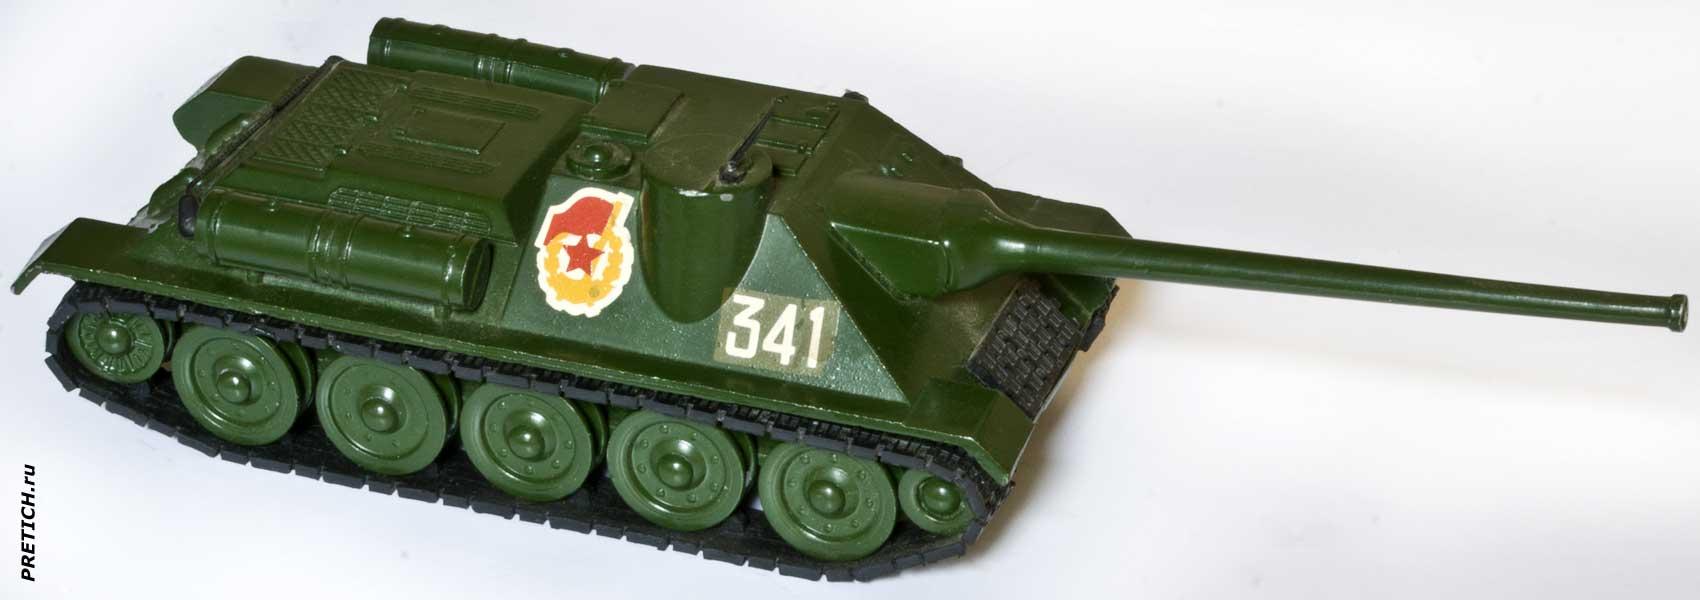 pretich.ru/st/1/10_su-100_ussr_antitank.jpg